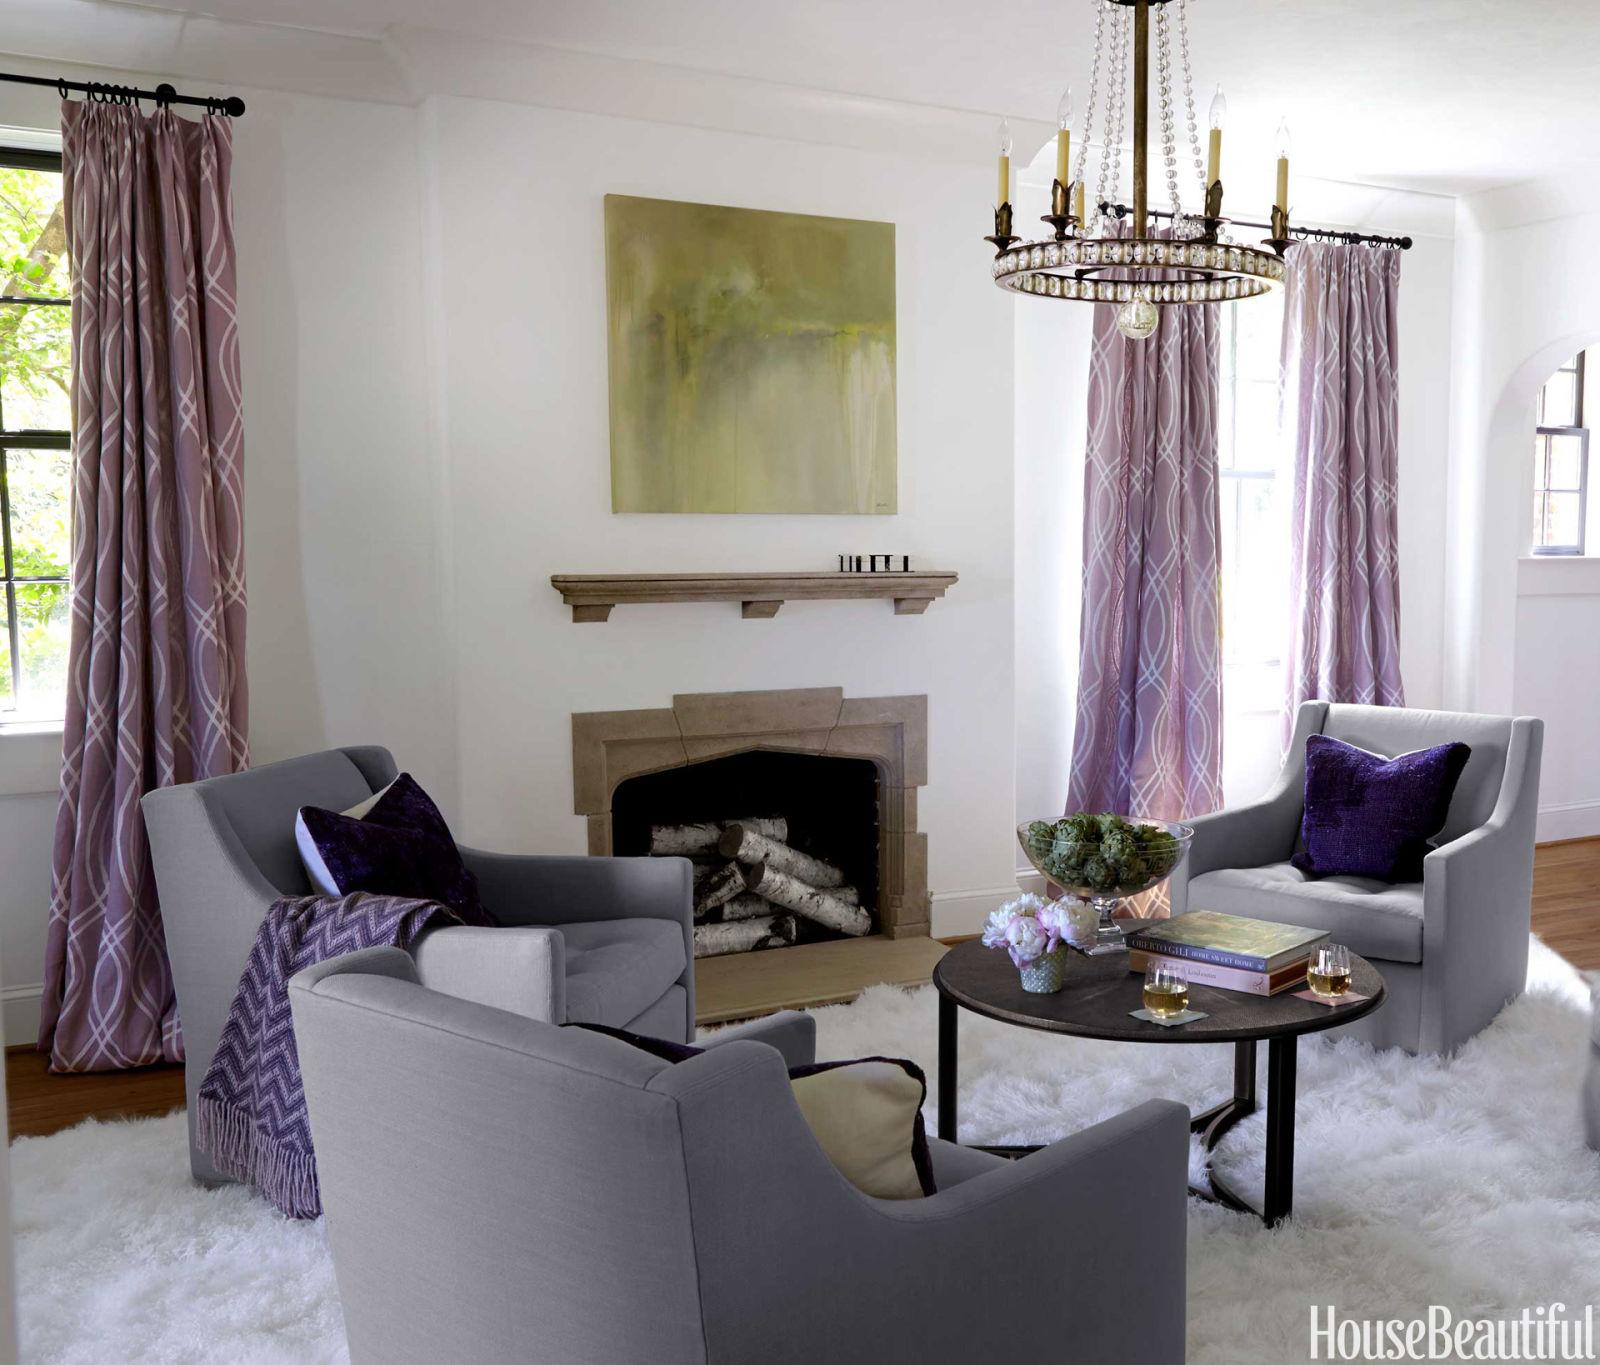 Living Room Club Chairs Glamorous And Feminine Getaway Apartment Glamorous Decorating Ideas